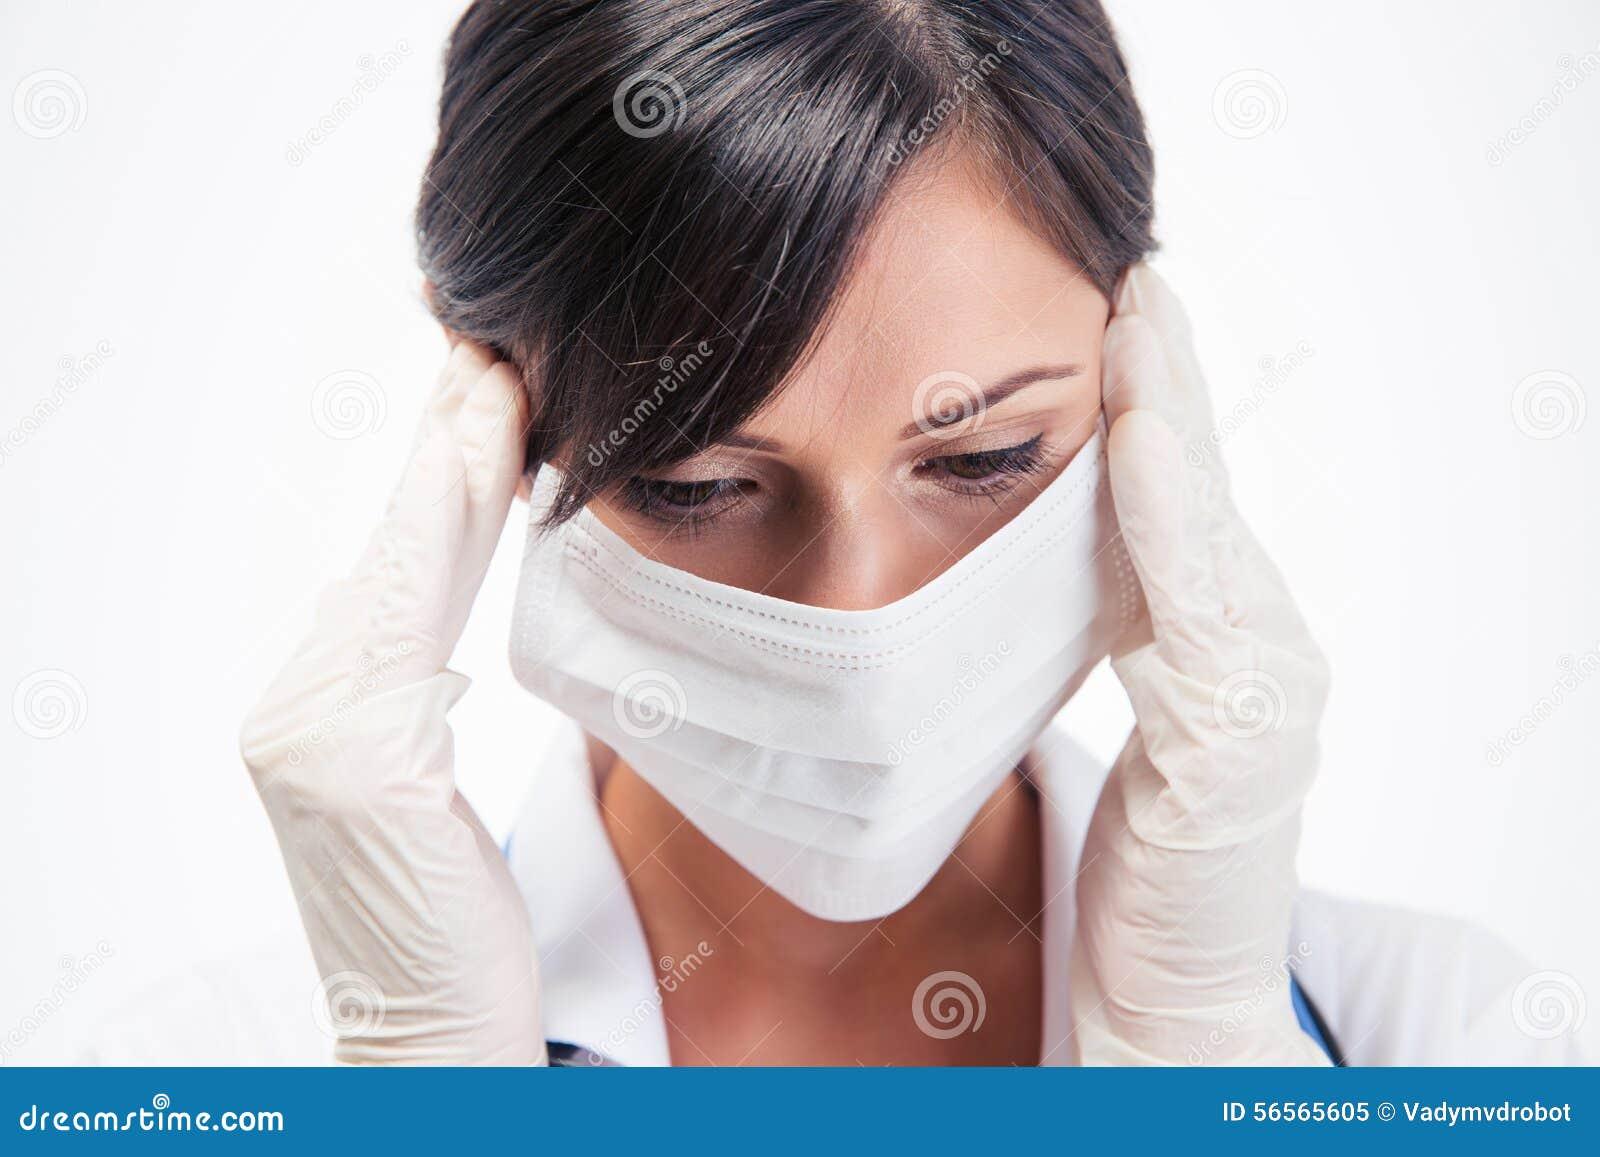 Download Πορτρέτο ενός σκεπτικού θηλυκού ιατρού στη μάσκα Στοκ Εικόνα - εικόνα από χαριτωμένος, ειδικός: 56565605